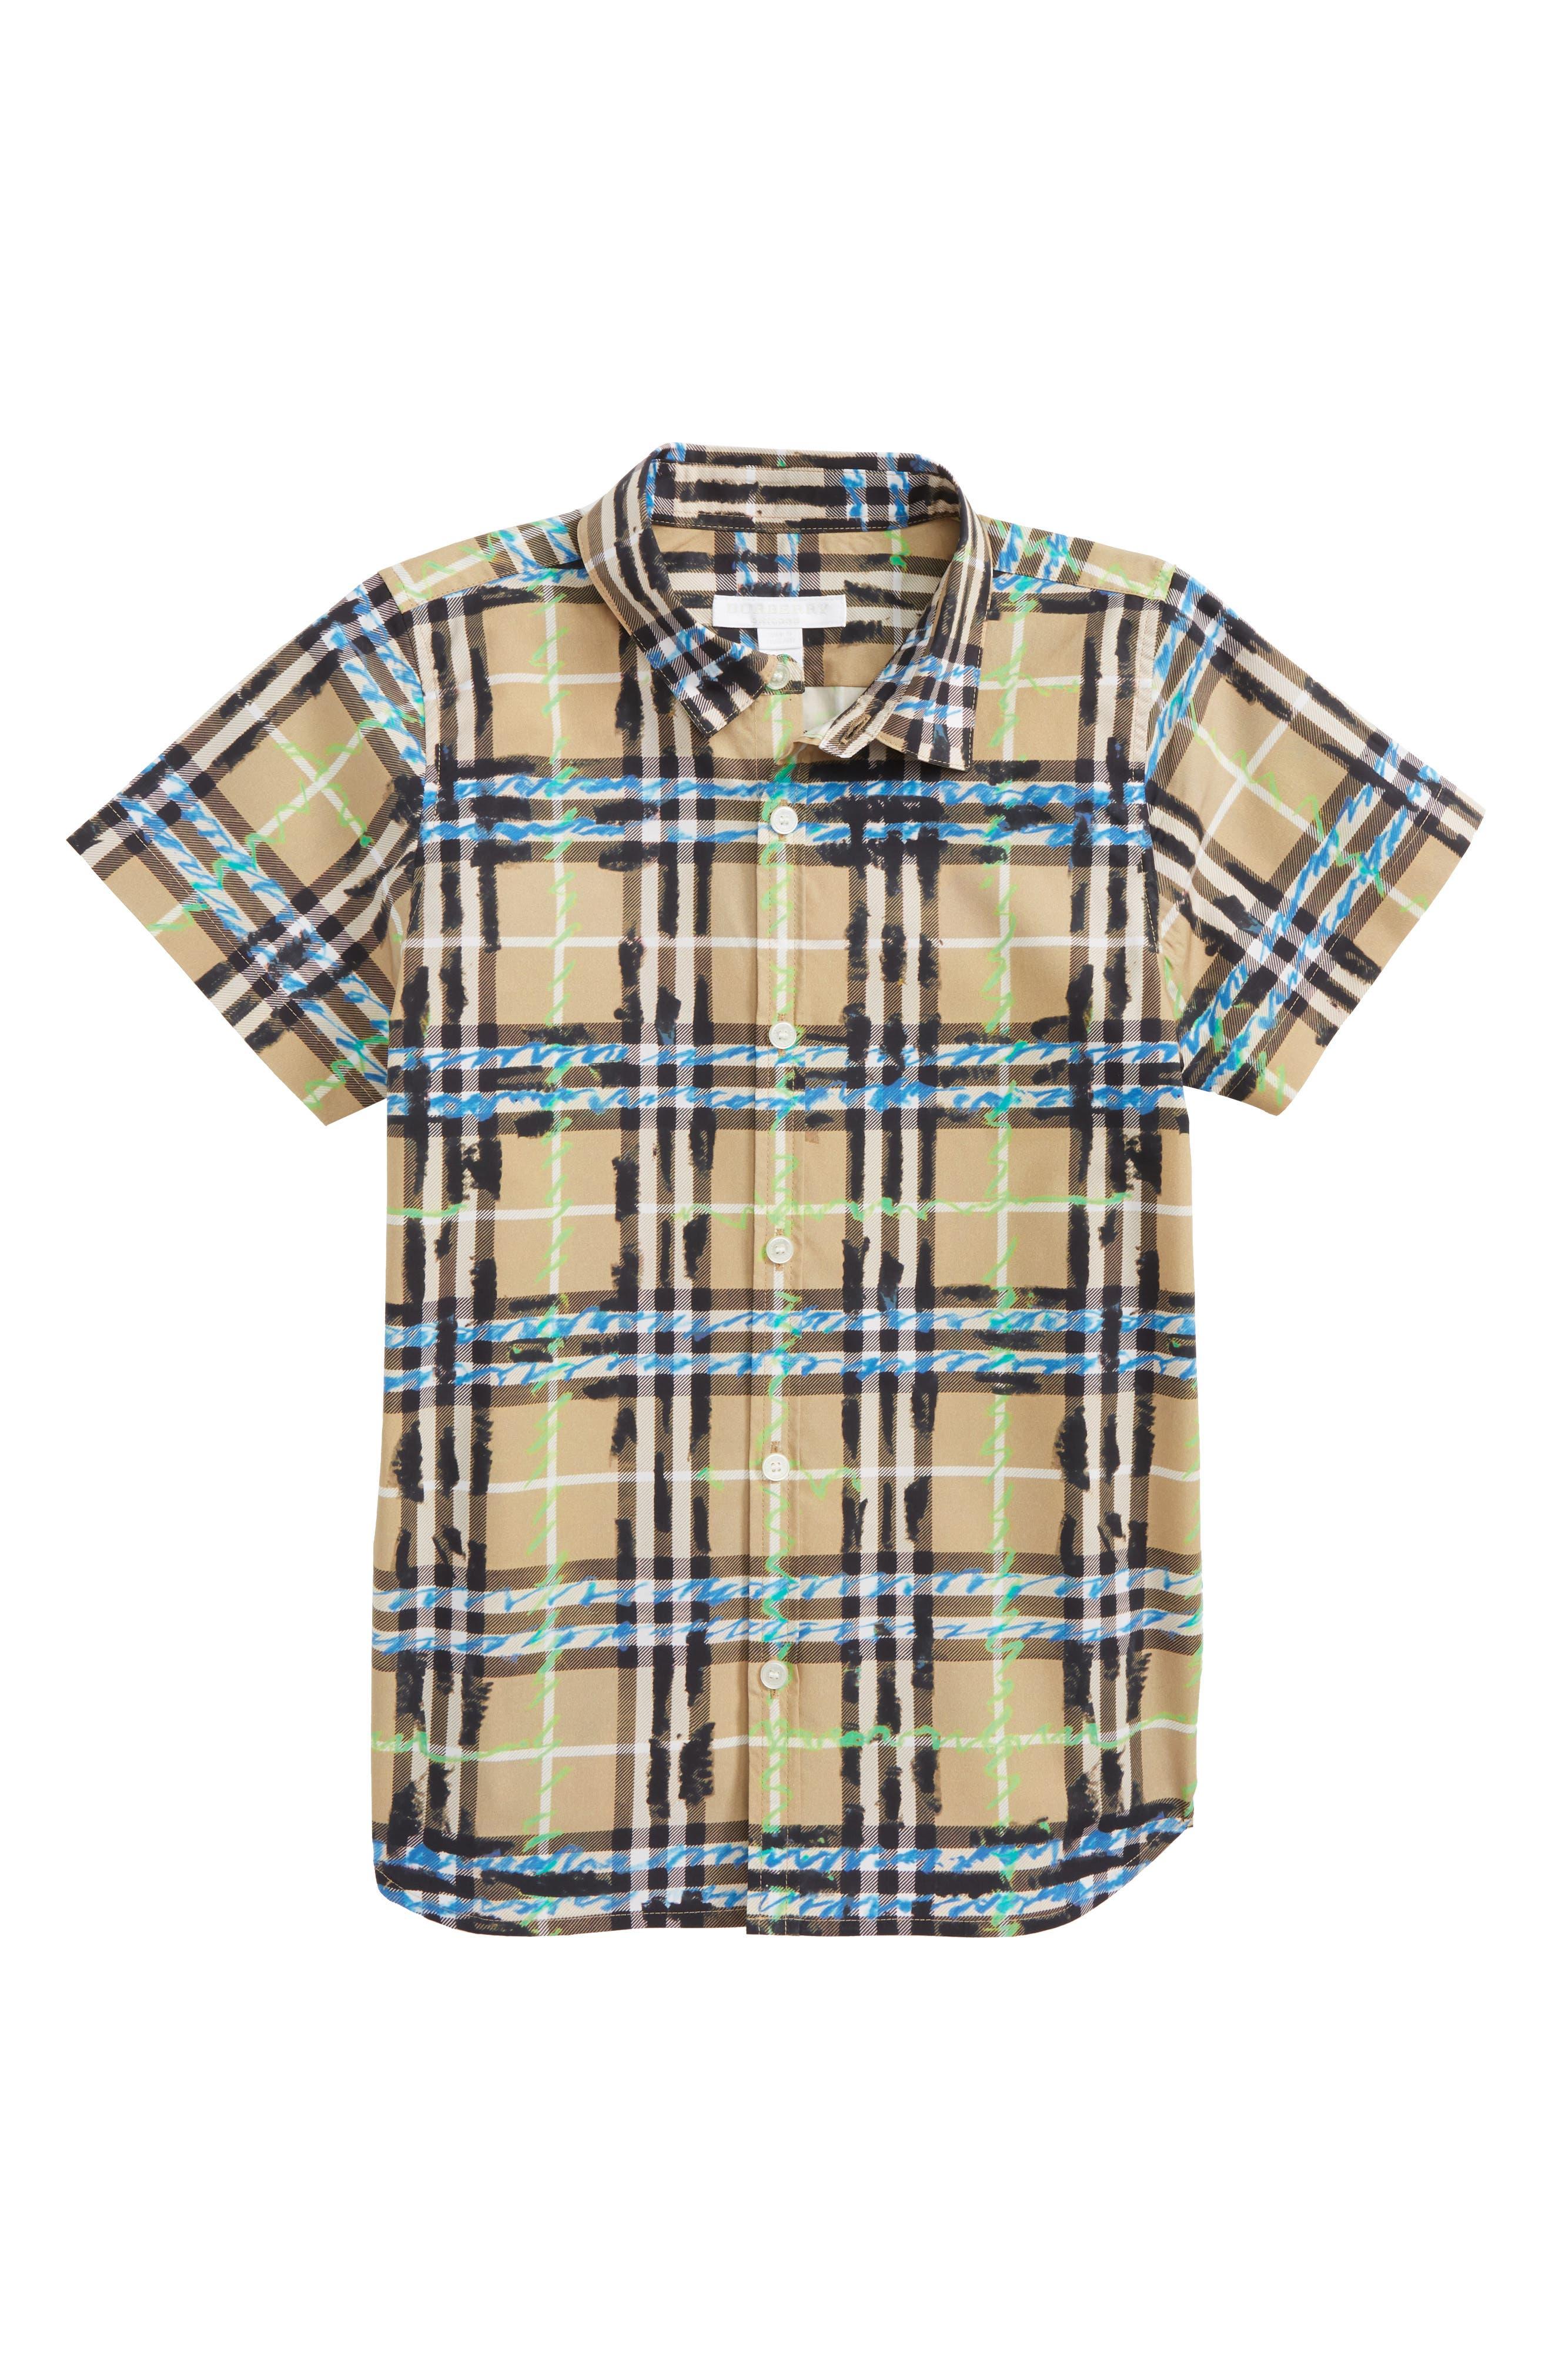 Clarkey Scribble Check Woven Shirt,                             Main thumbnail 1, color,                             Bright Blue